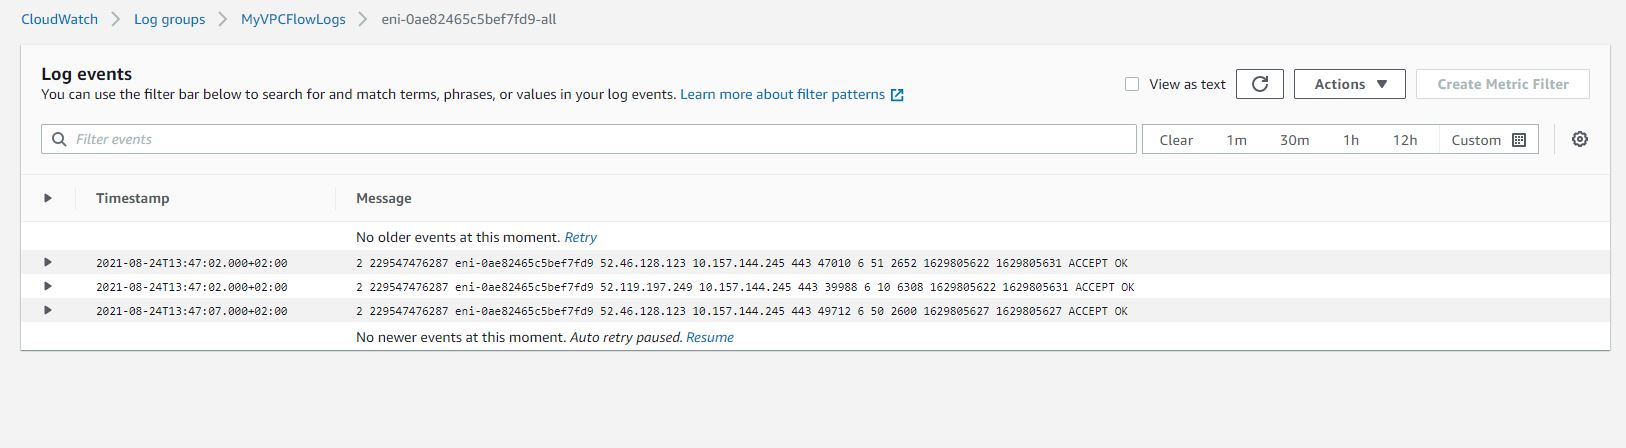 Create vpc flow logs Cloudwatch log example